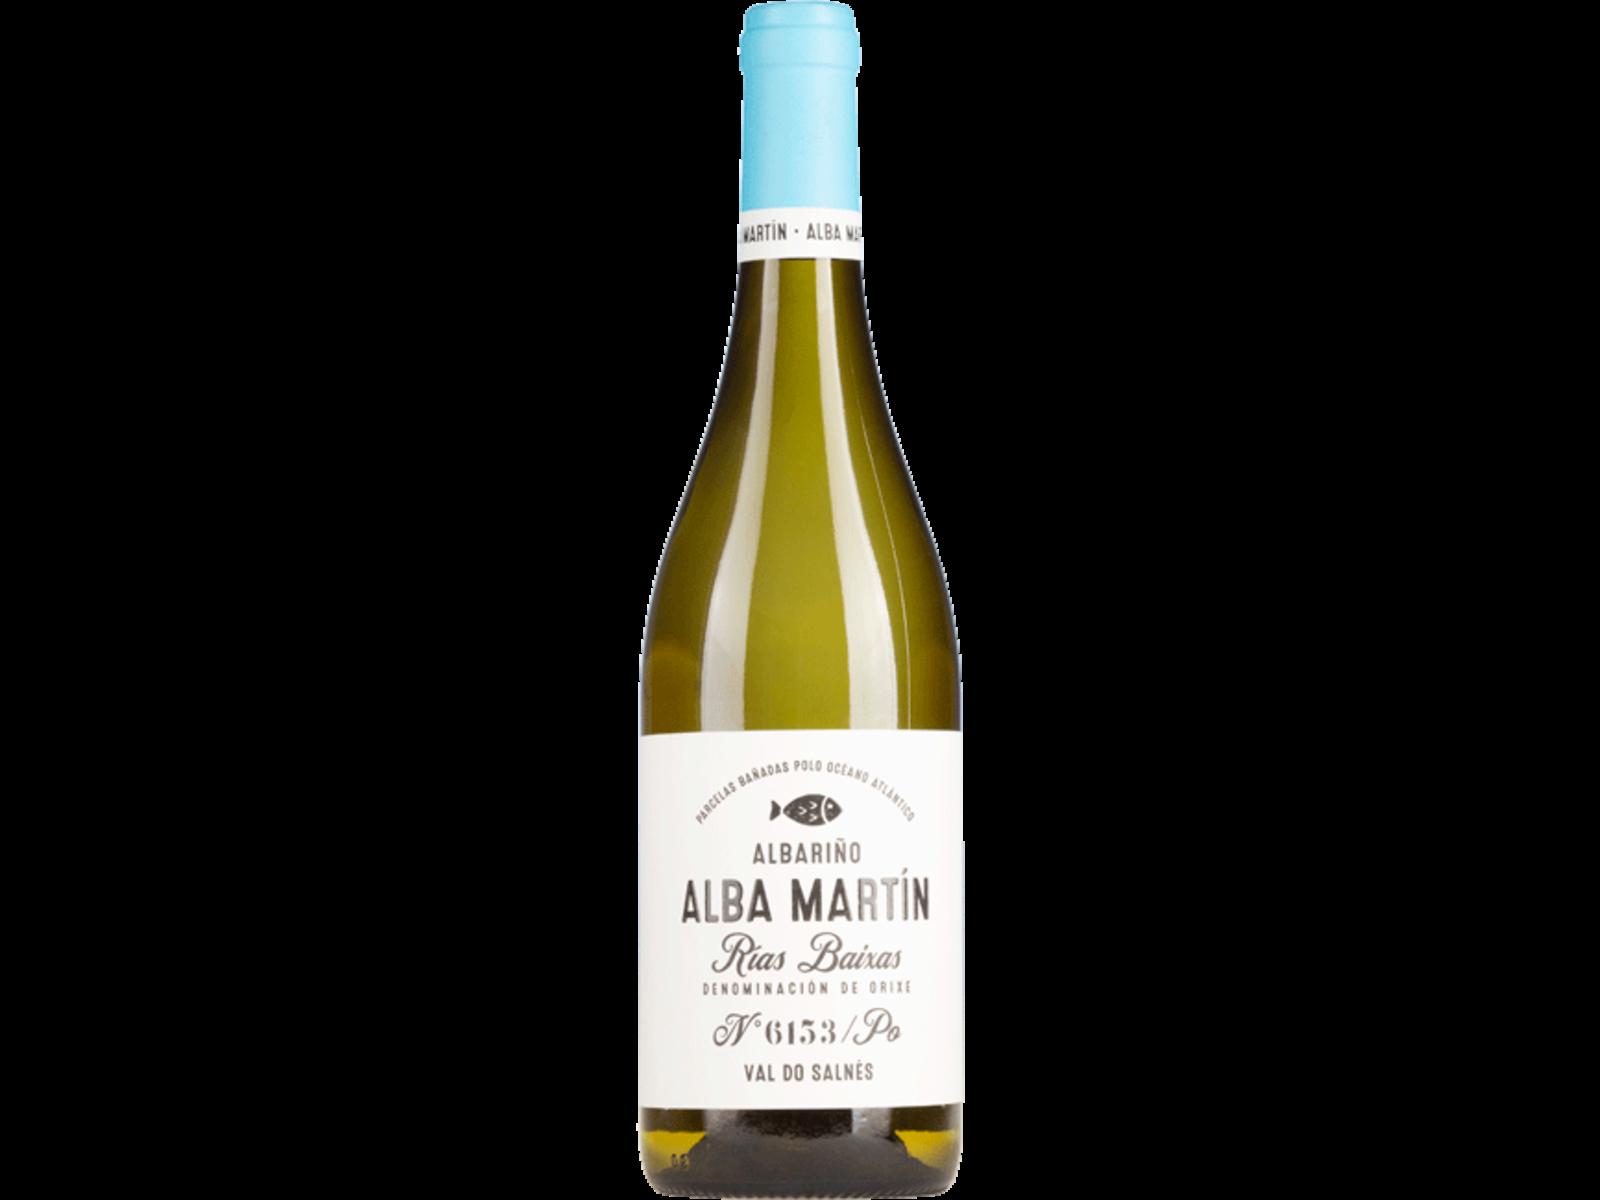 Alba Martin Alba Martin / Rias Baixas / Albarino